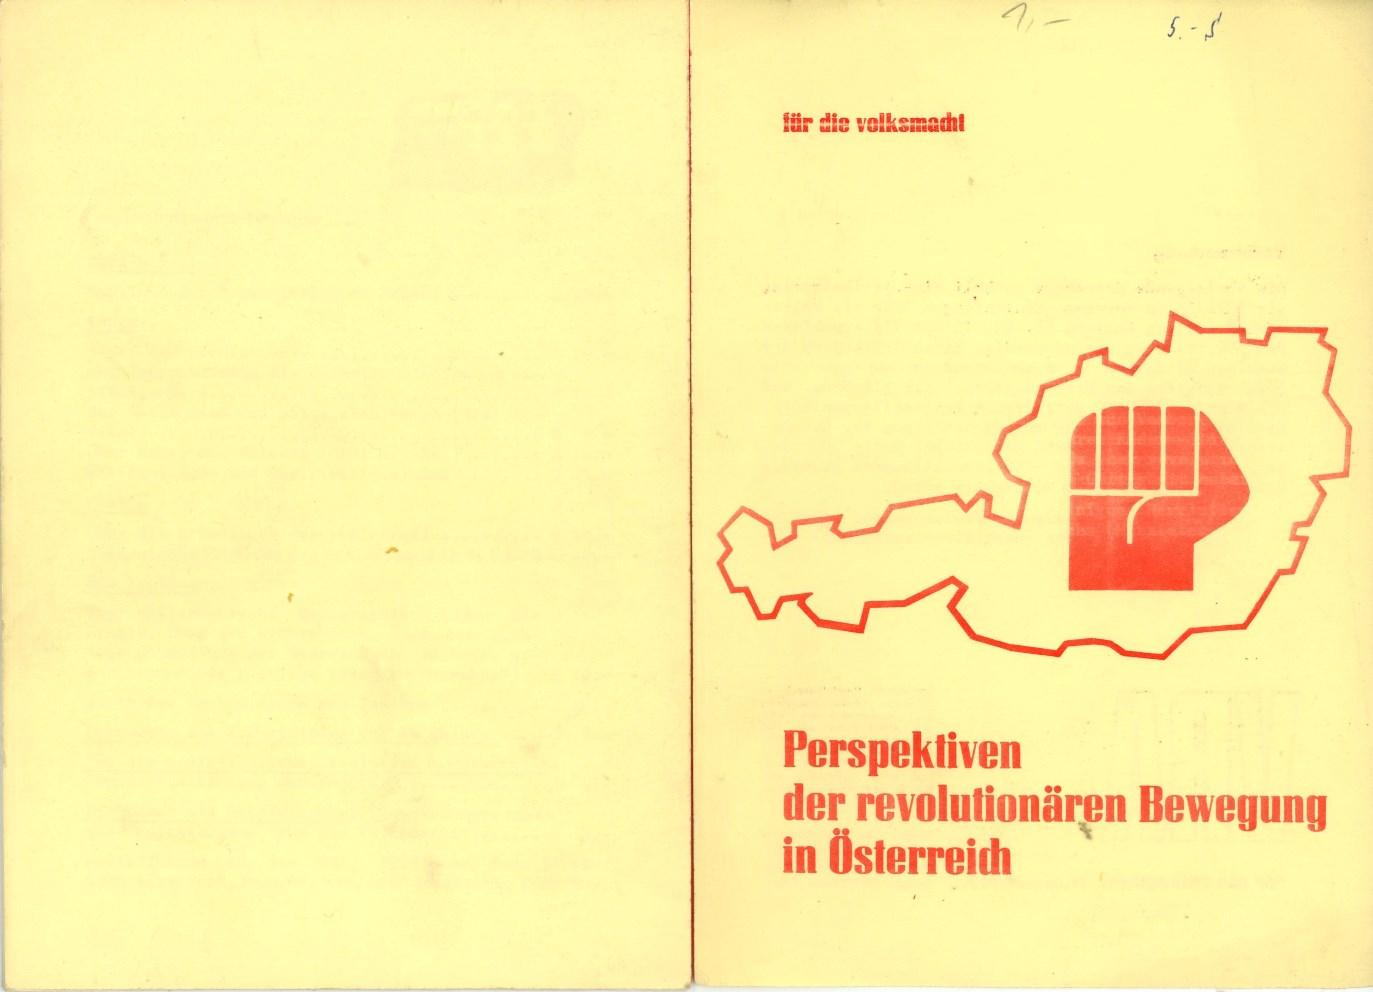 VRA_Perspektiven_1975_01